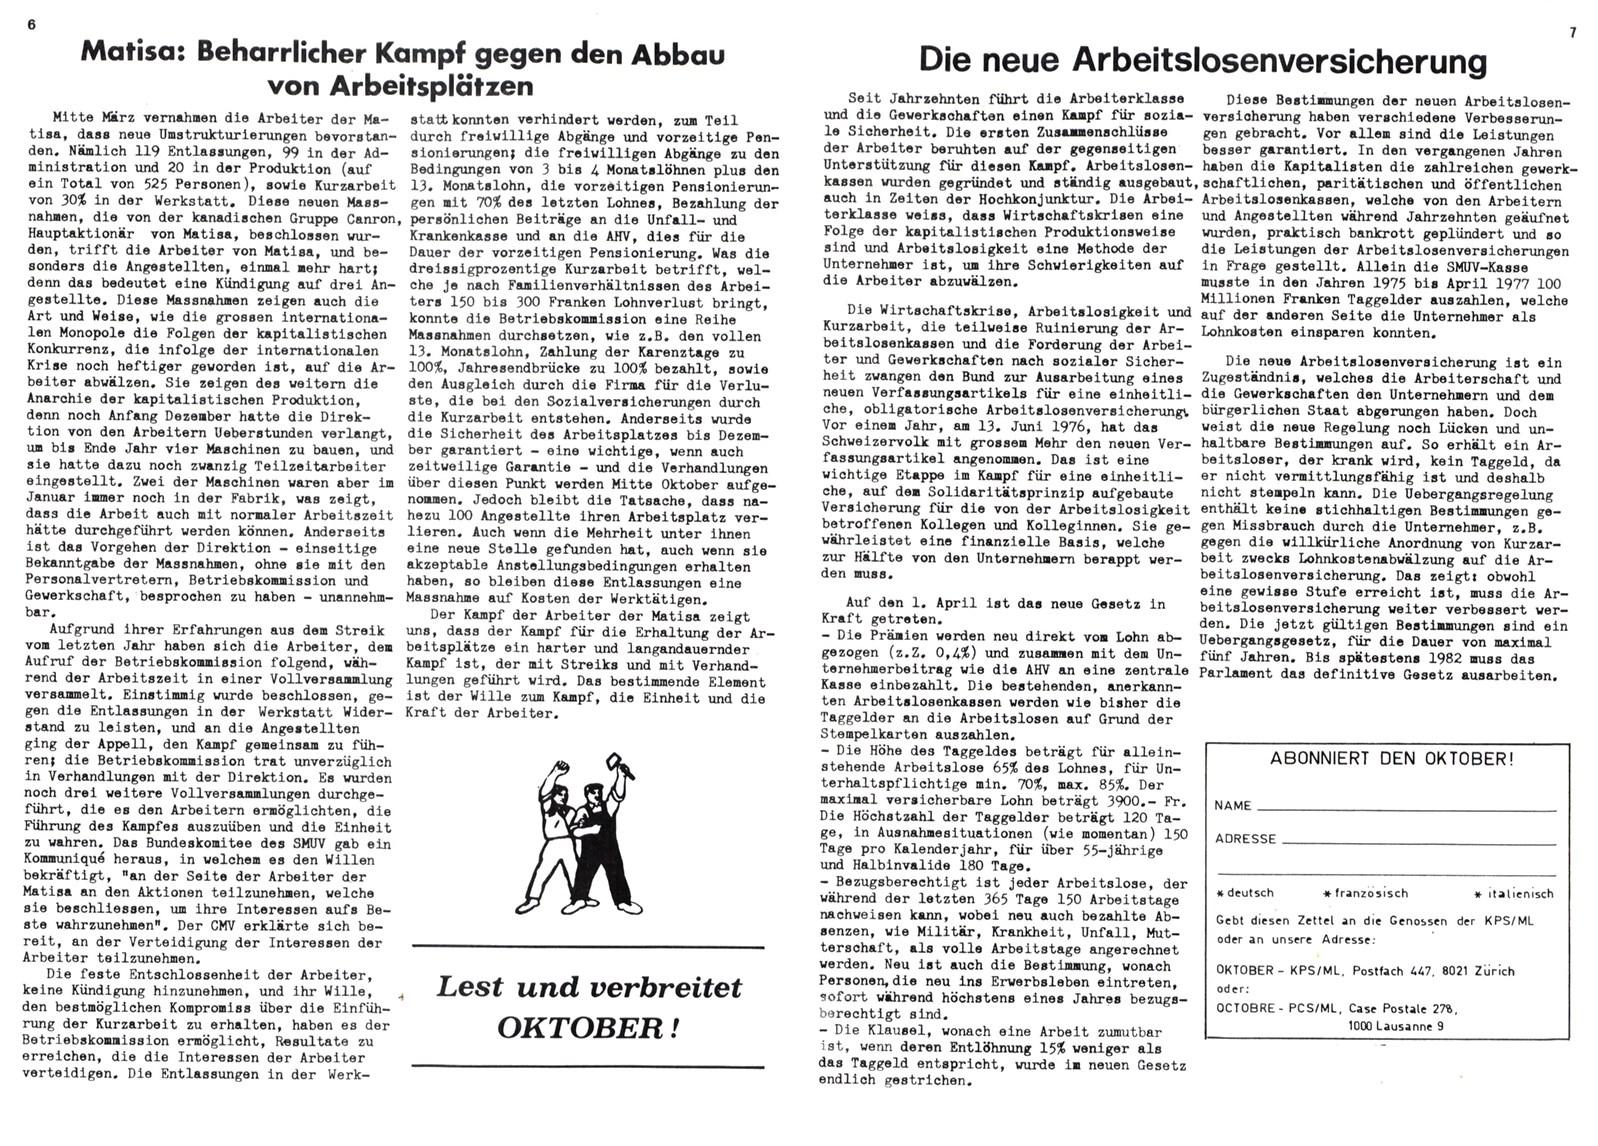 Schweiz_KPSML_Oktober_19770700_112_004